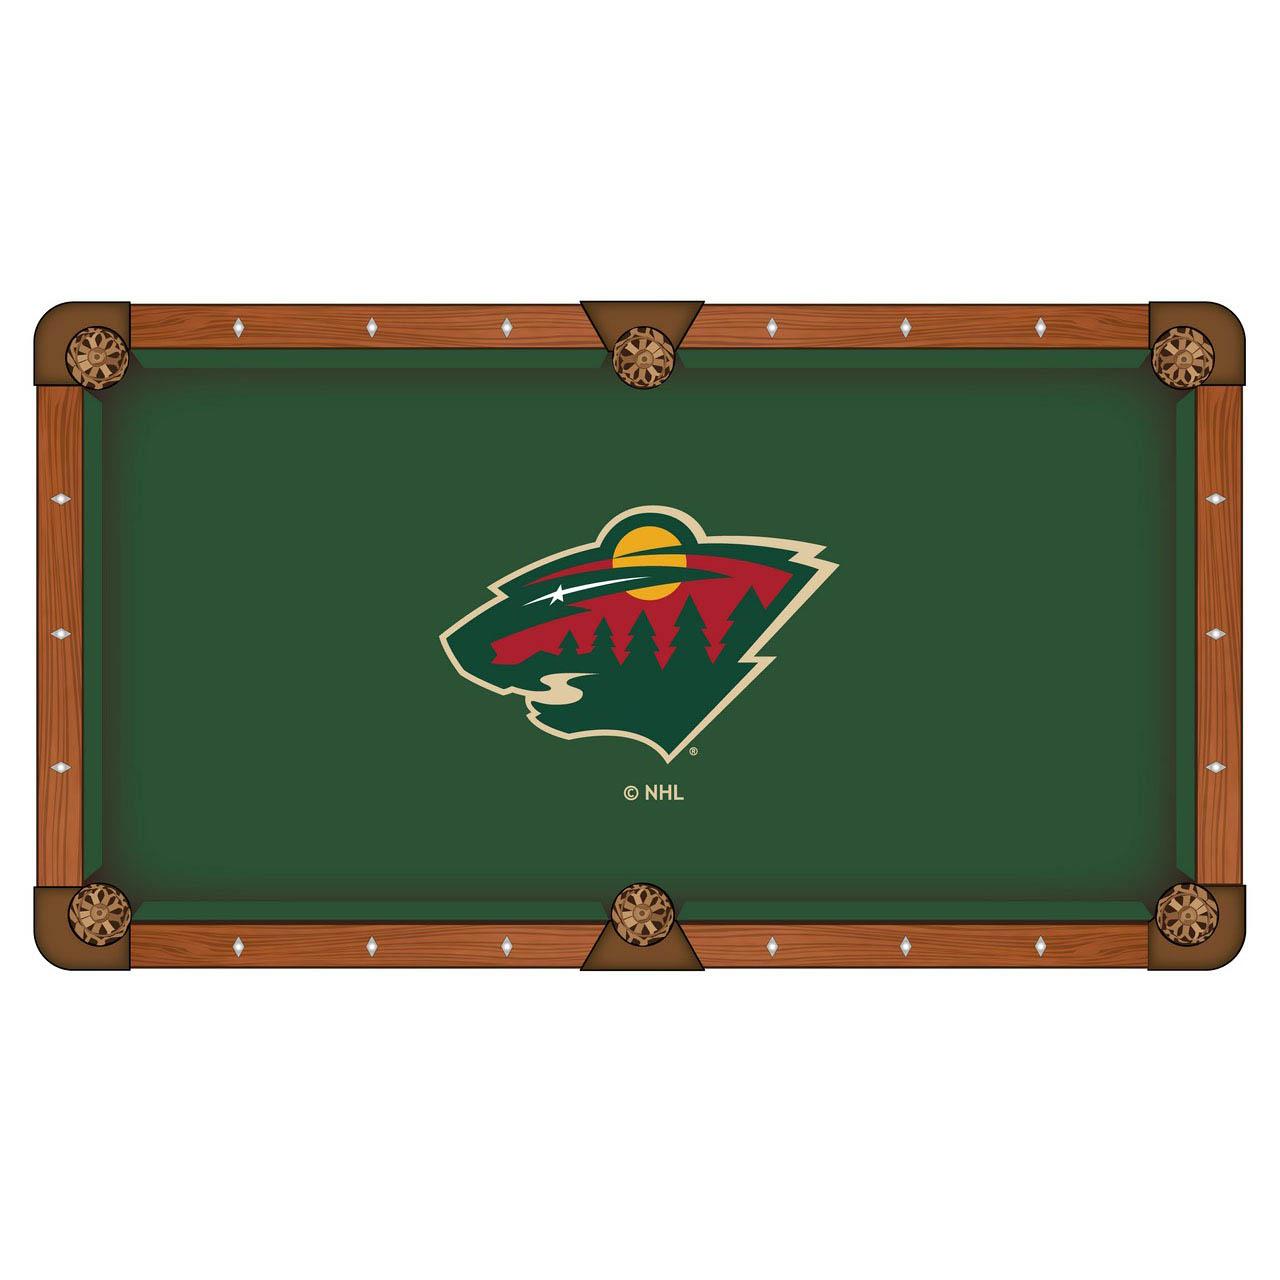 Amazing Minnesota Wild Pool Table Cloth Product Photo